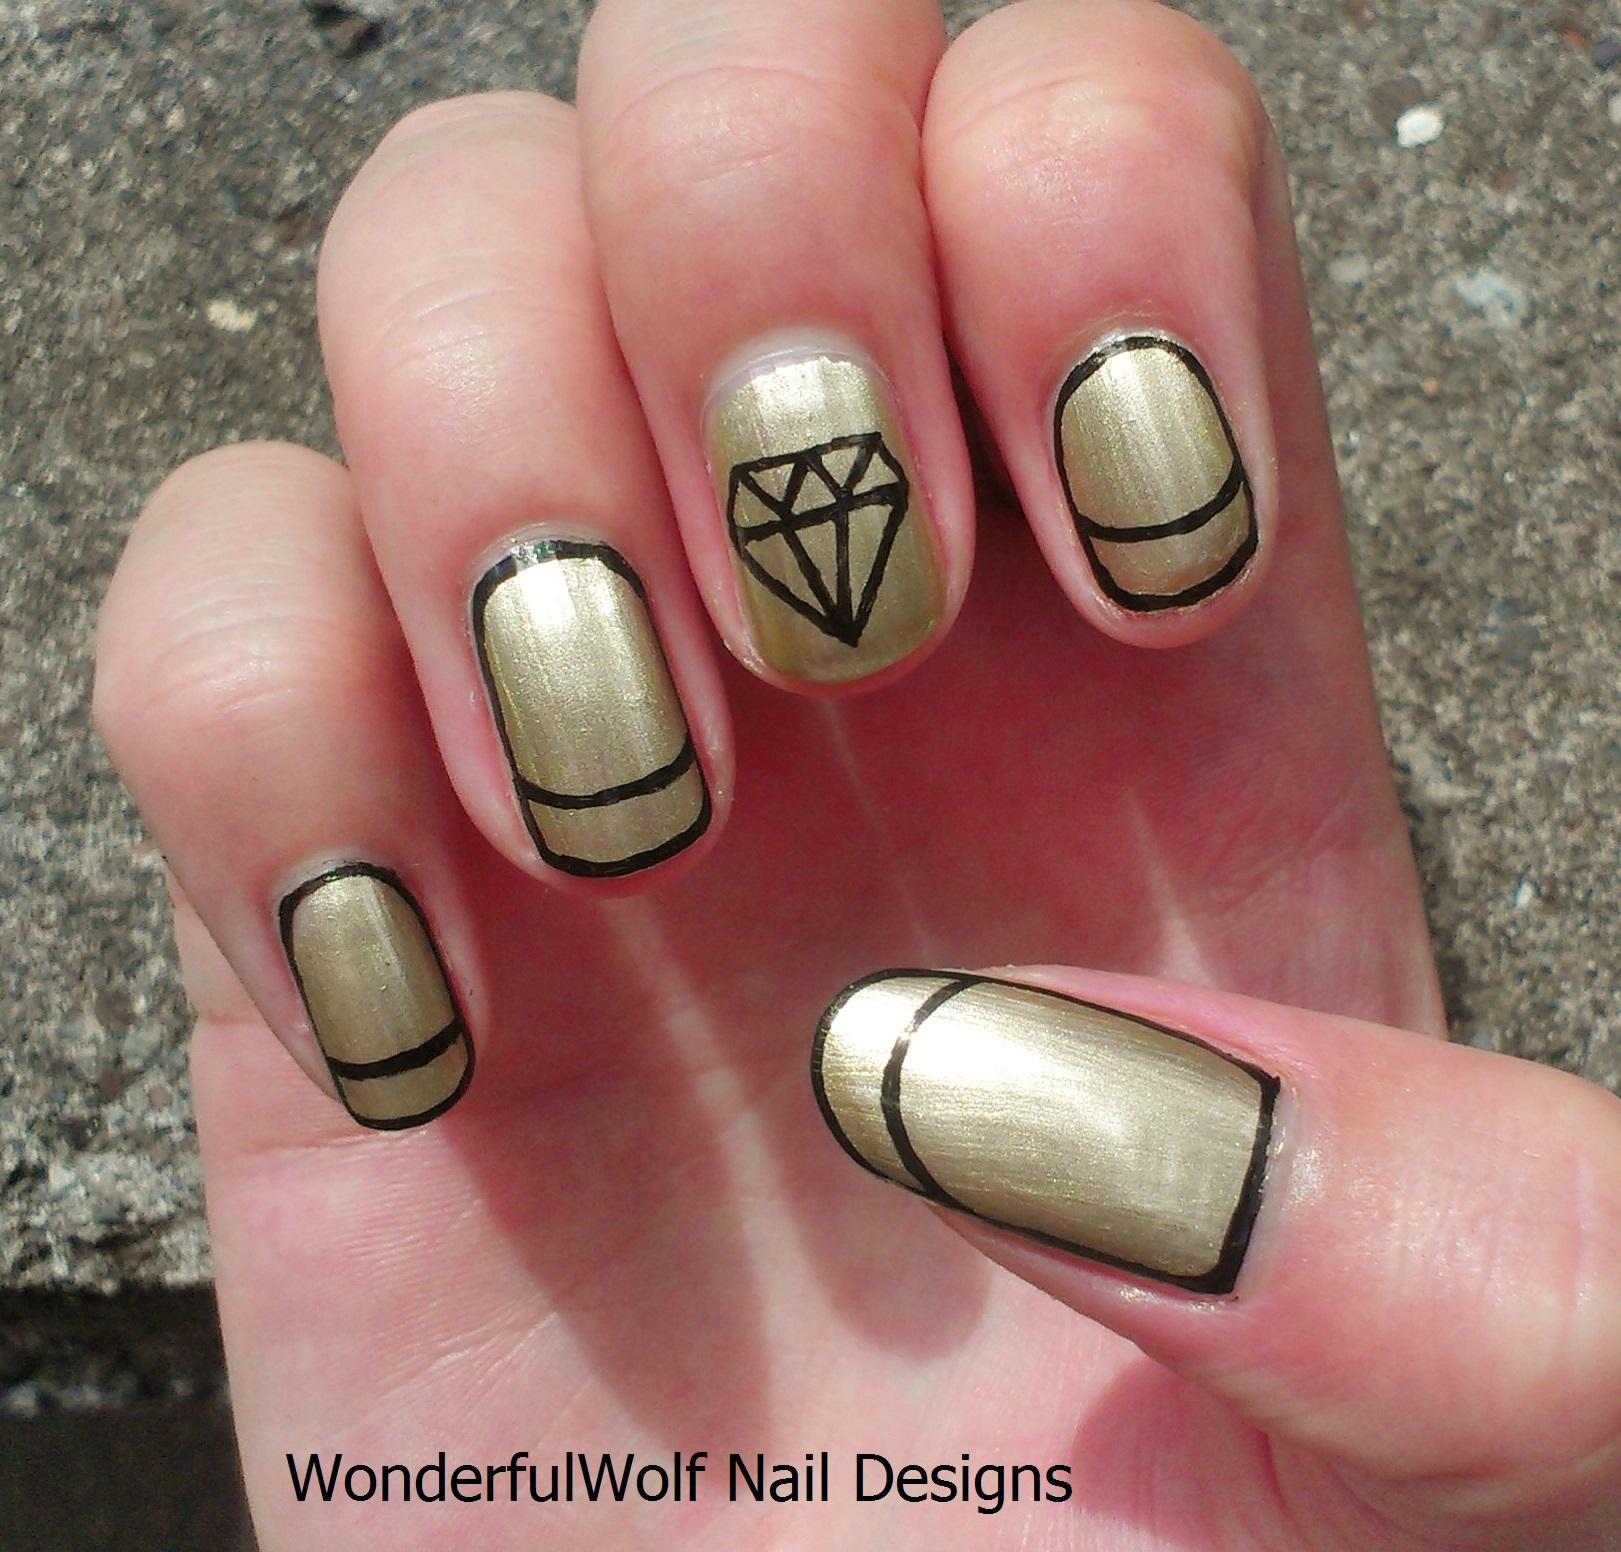 Nail Art Design With Diamond: Diamond nails. Best diamond nail art ...